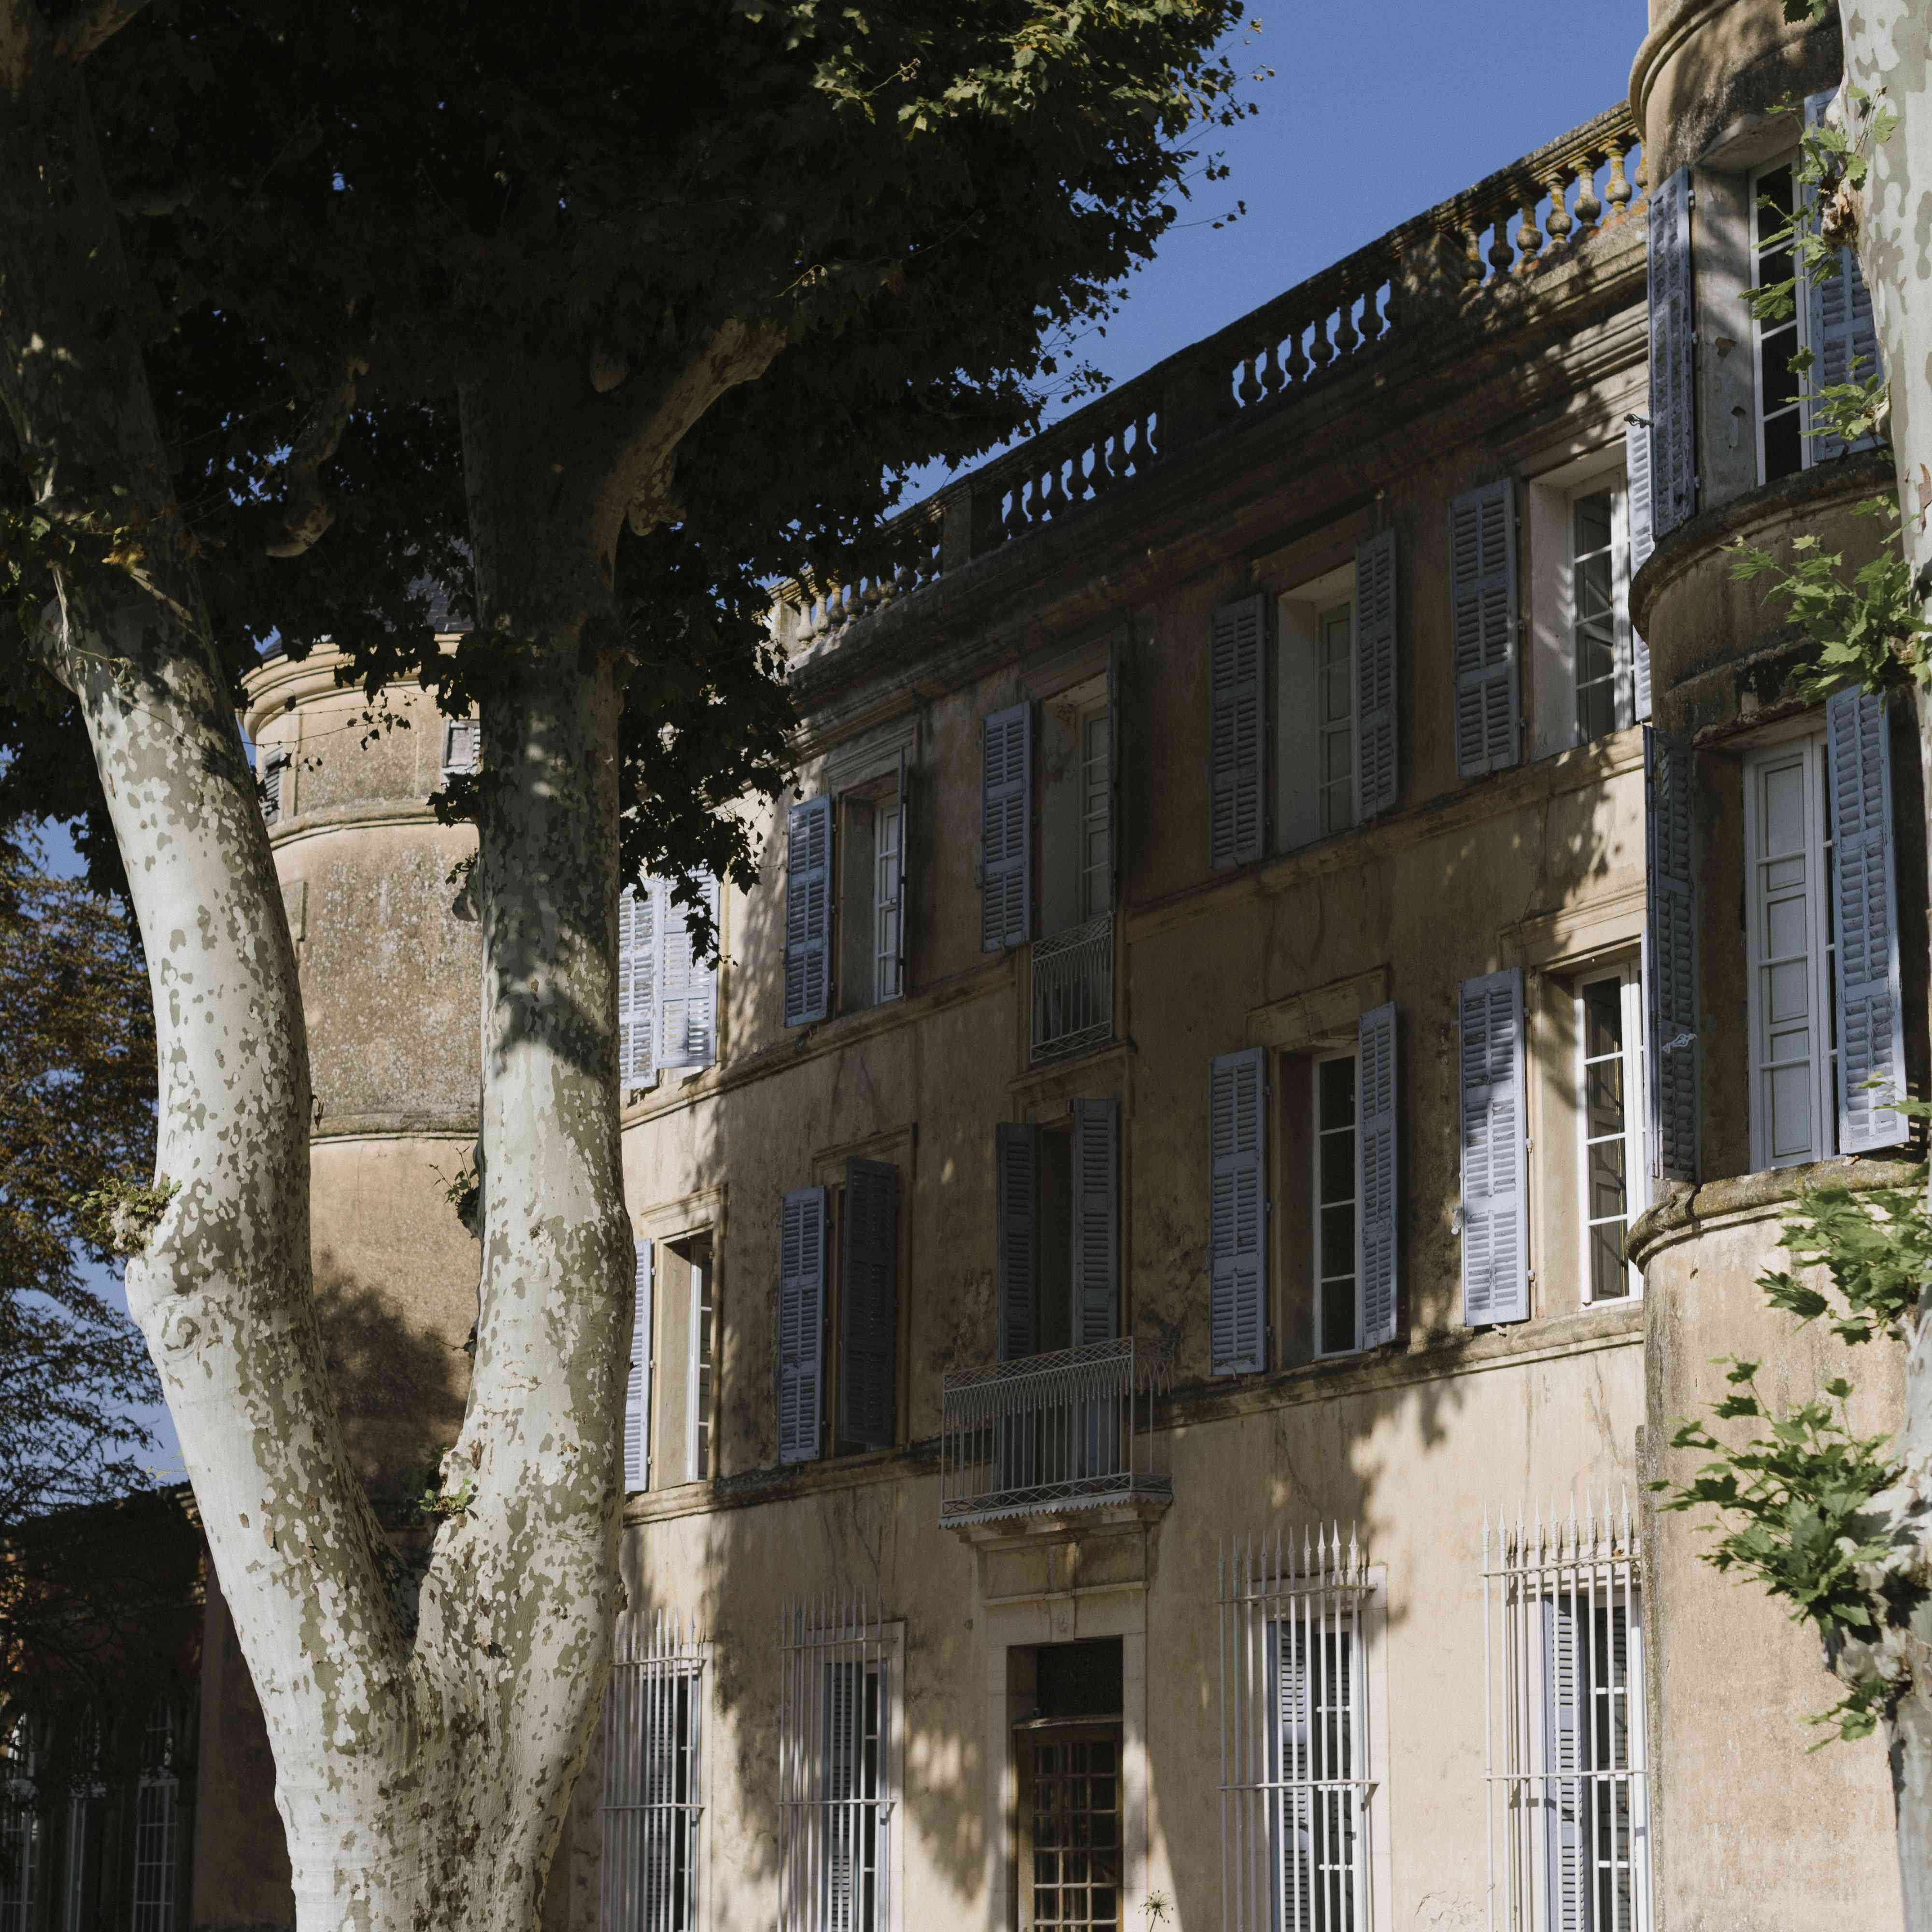 <p>chateau wedding venue</p><br><br>